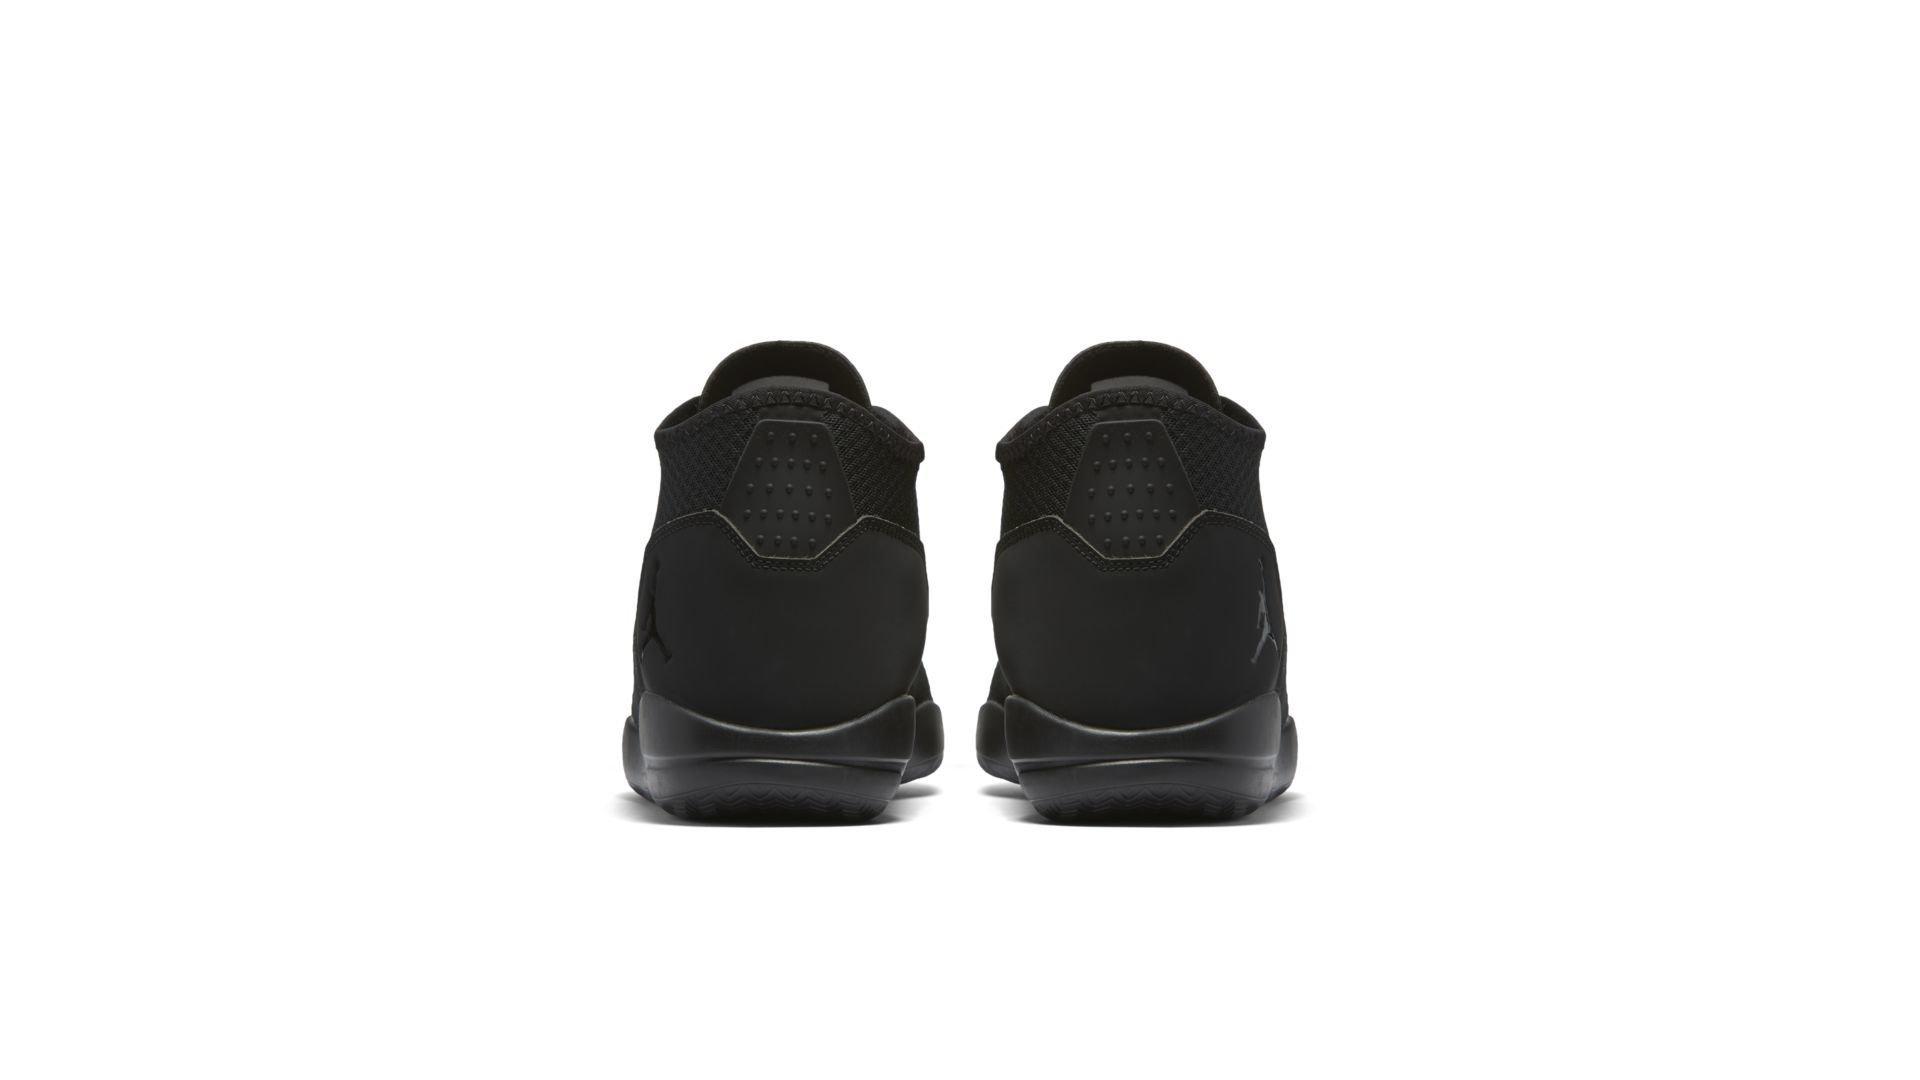 Jordan Reveal Triple Black (834064-020)